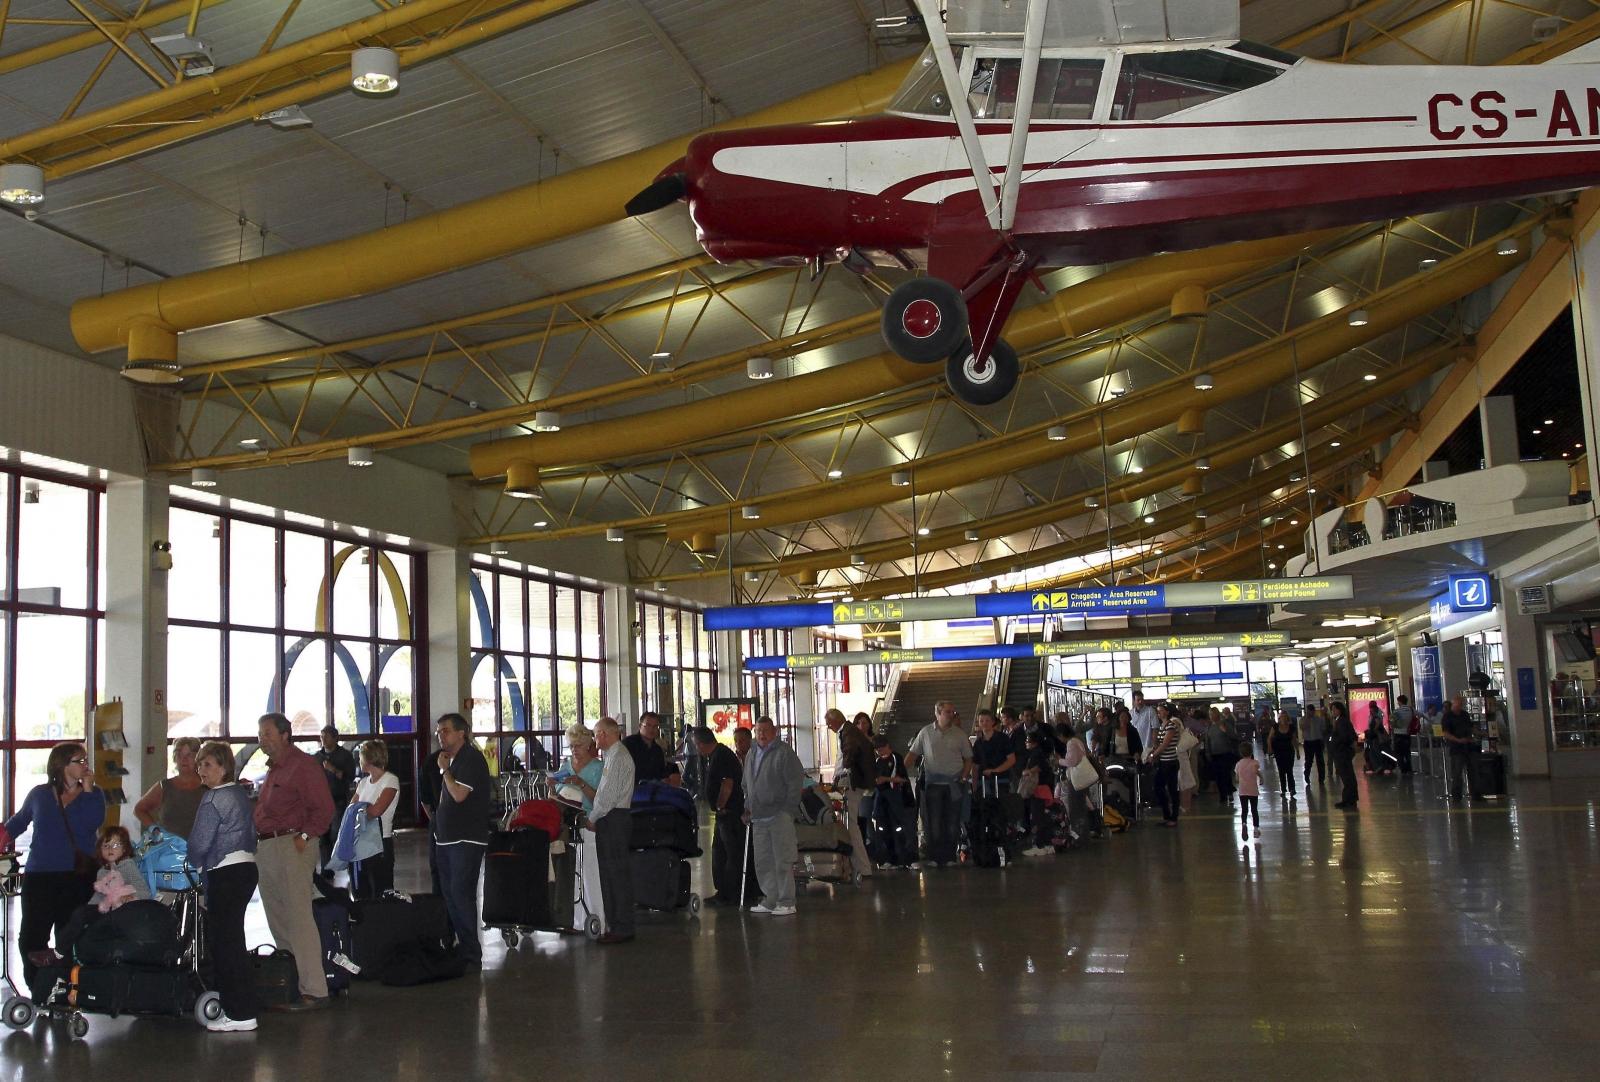 Dutch And Company >> Portugal: Bus crash kills 3 Dutch tourists, injures 30